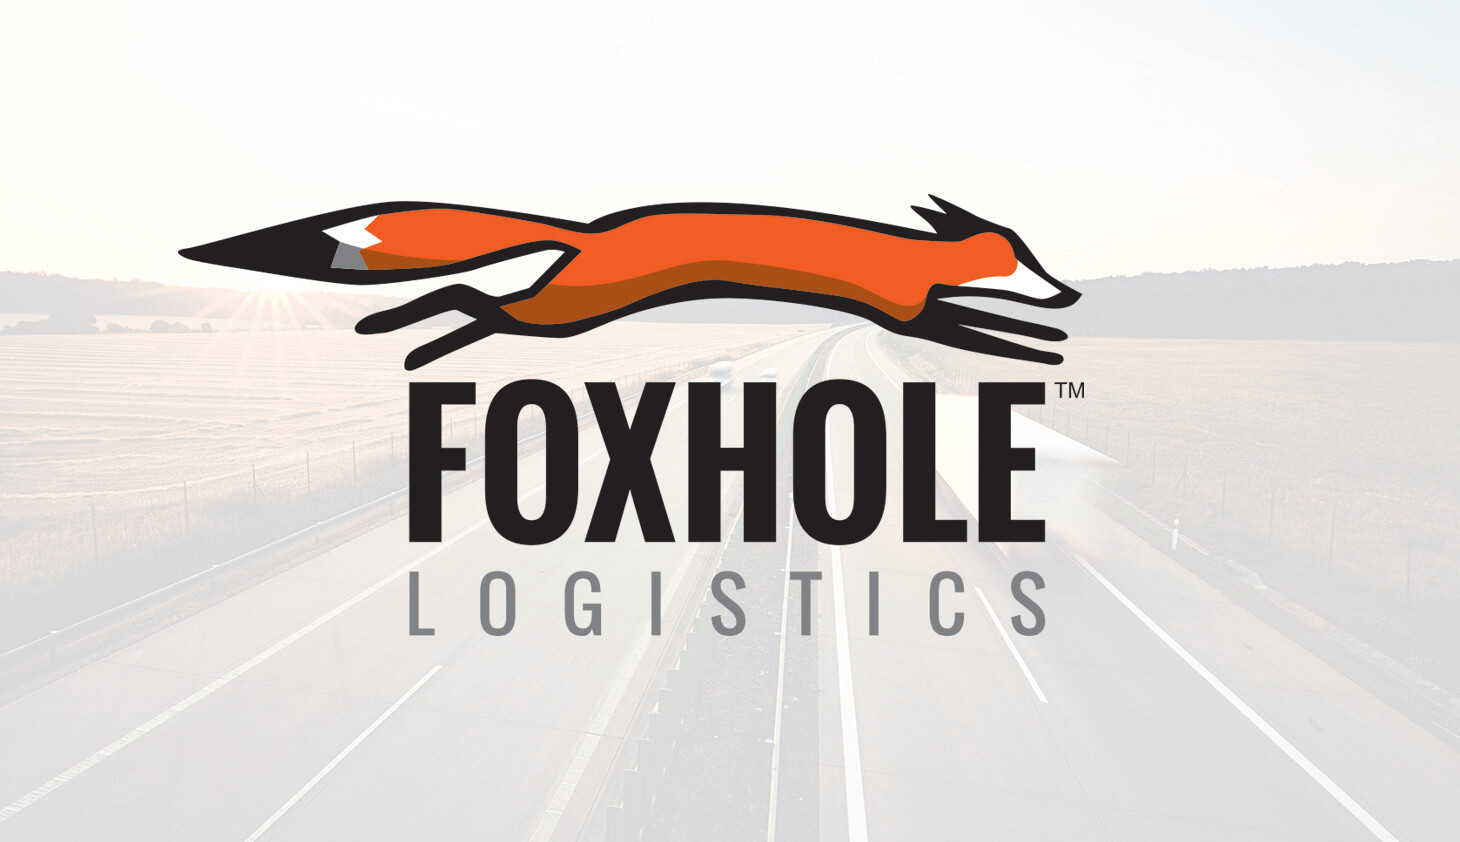 orlando branding agency brands Foxhole logitstics